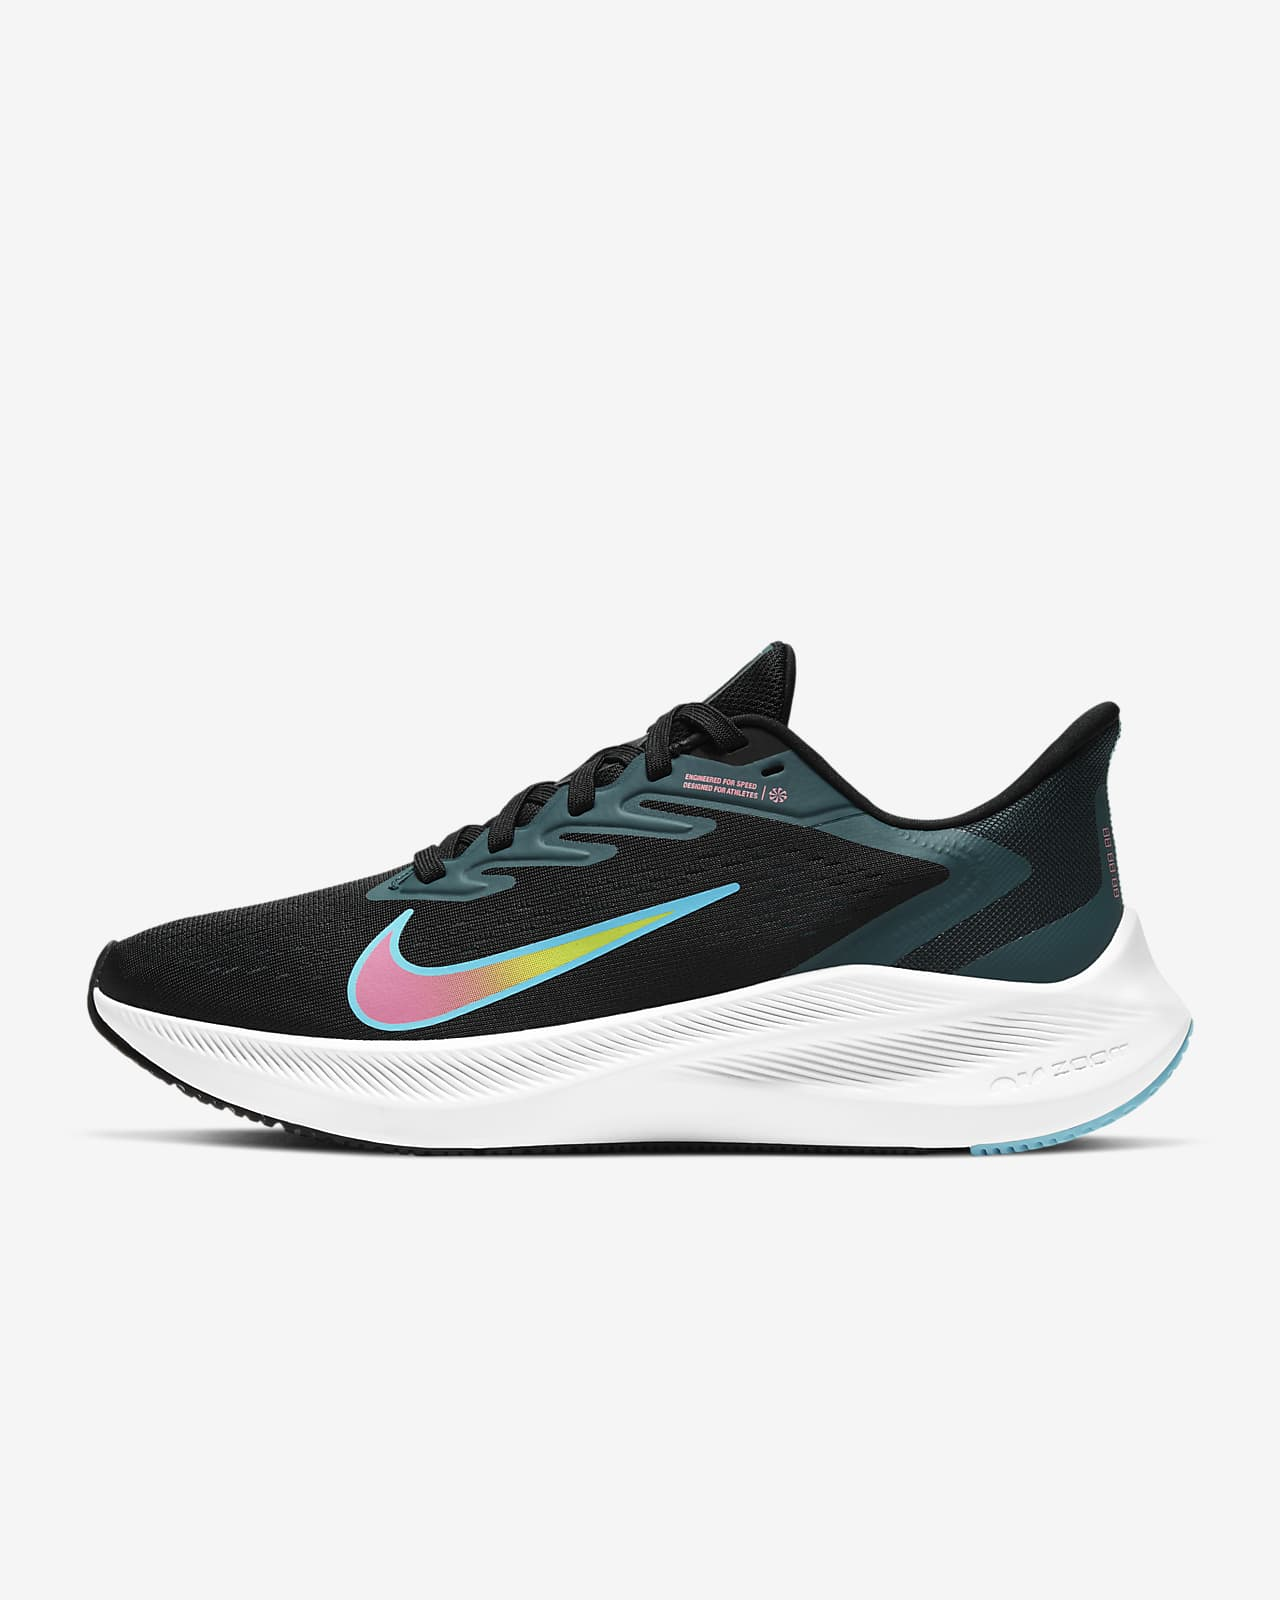 lecho Circular Sensación  Nike Air Zoom Winflo 7 Women's Running Shoe. Nike VN